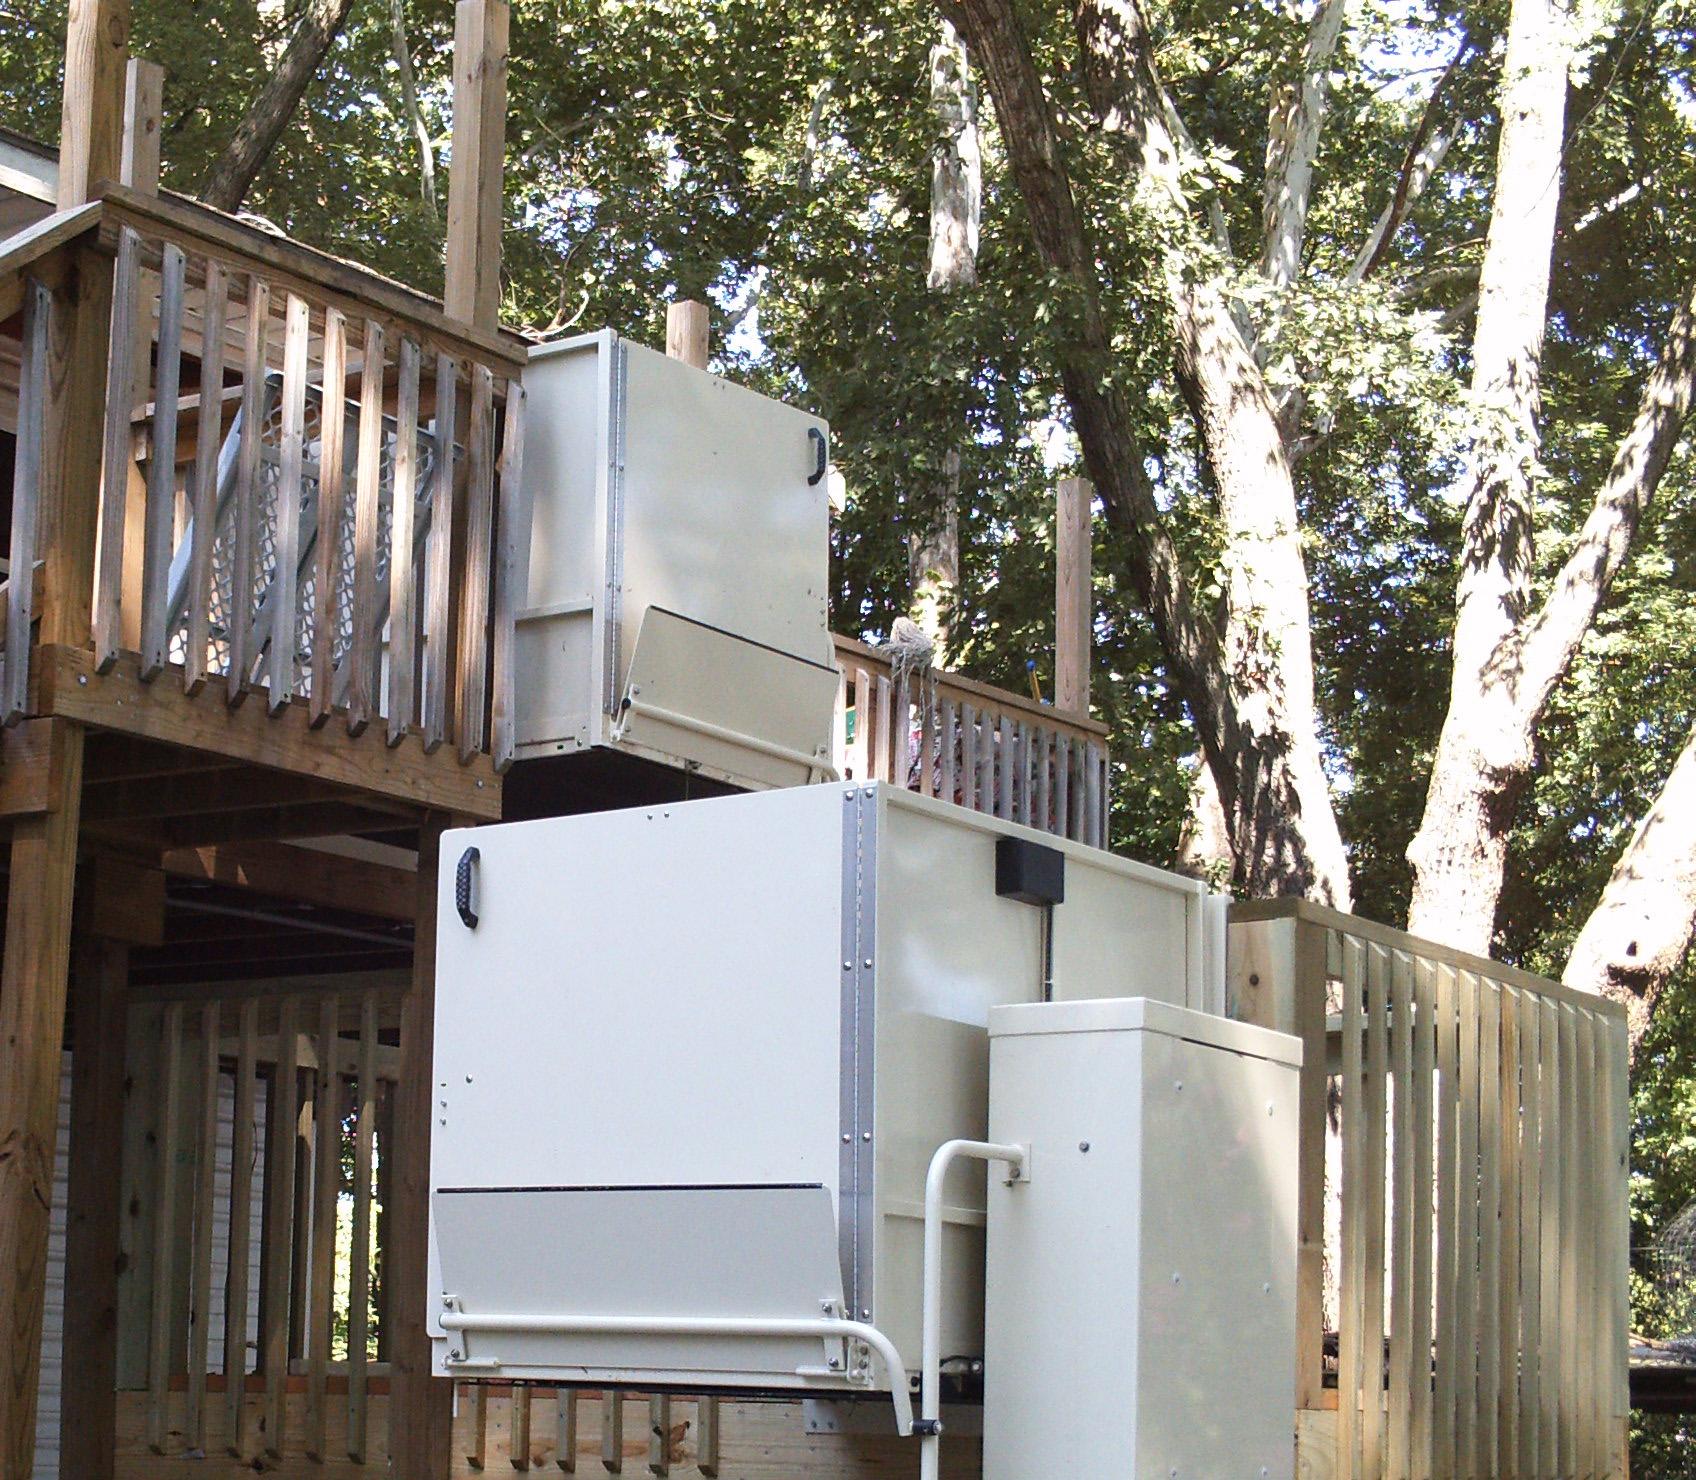 Macu0027s Vertical Home Lift PL 72 W/ ADA Package #macshomelift